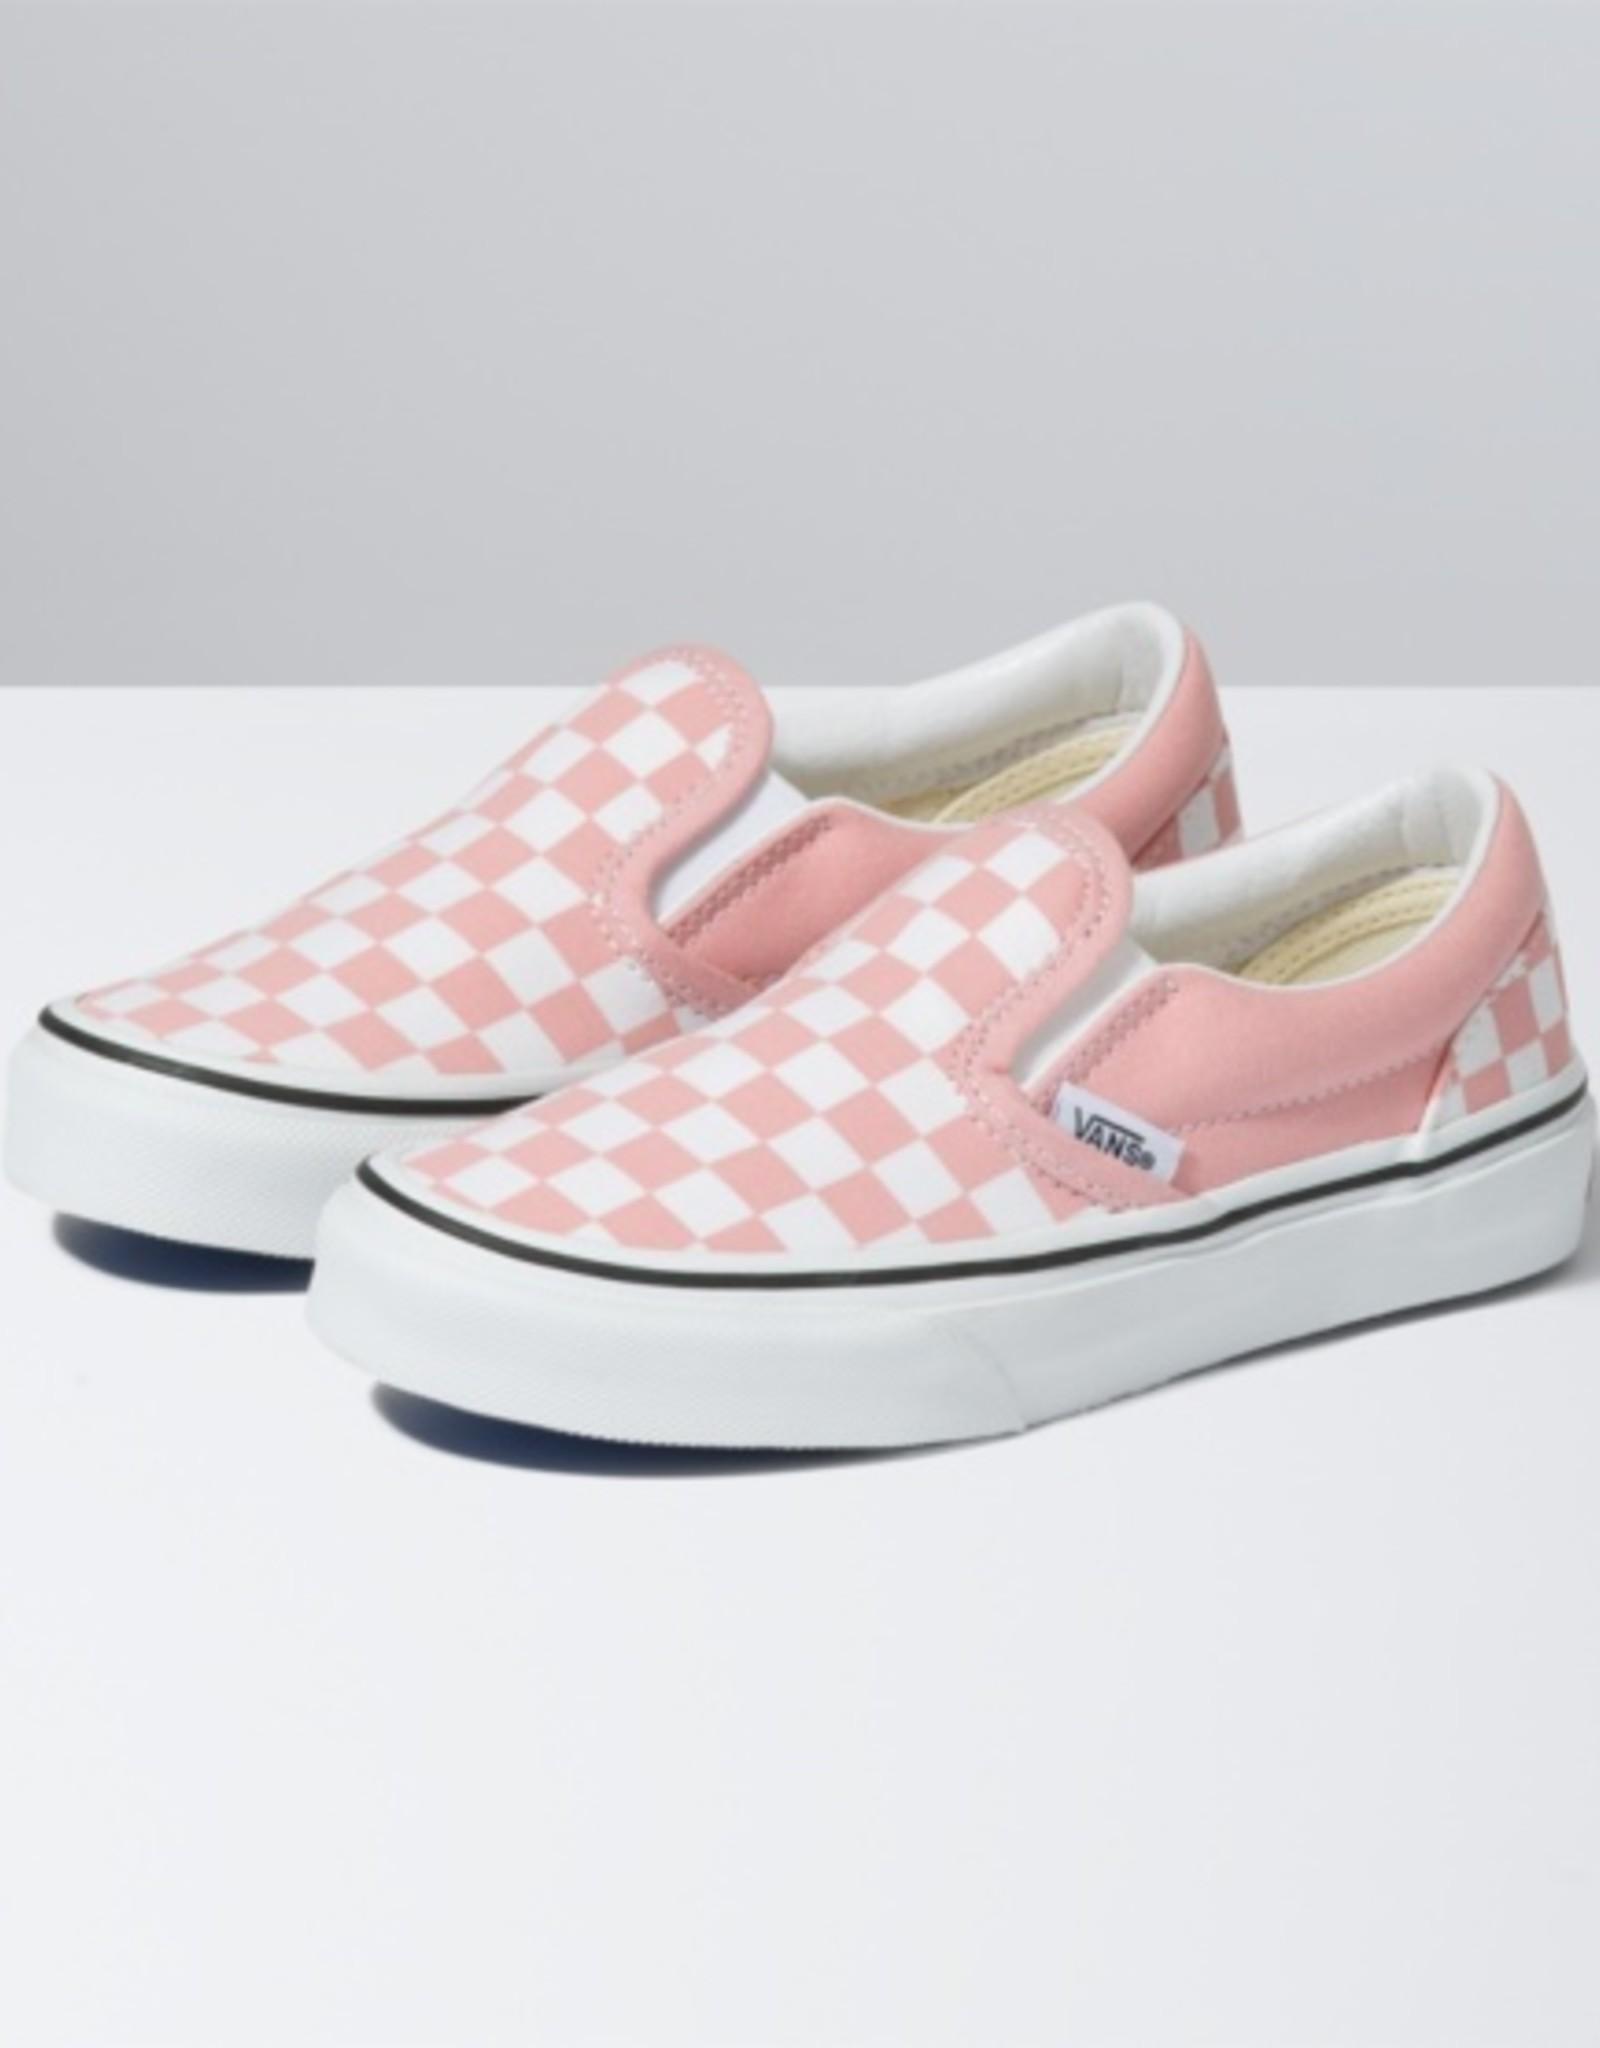 Vans Slip-On V Checkerboard Pink